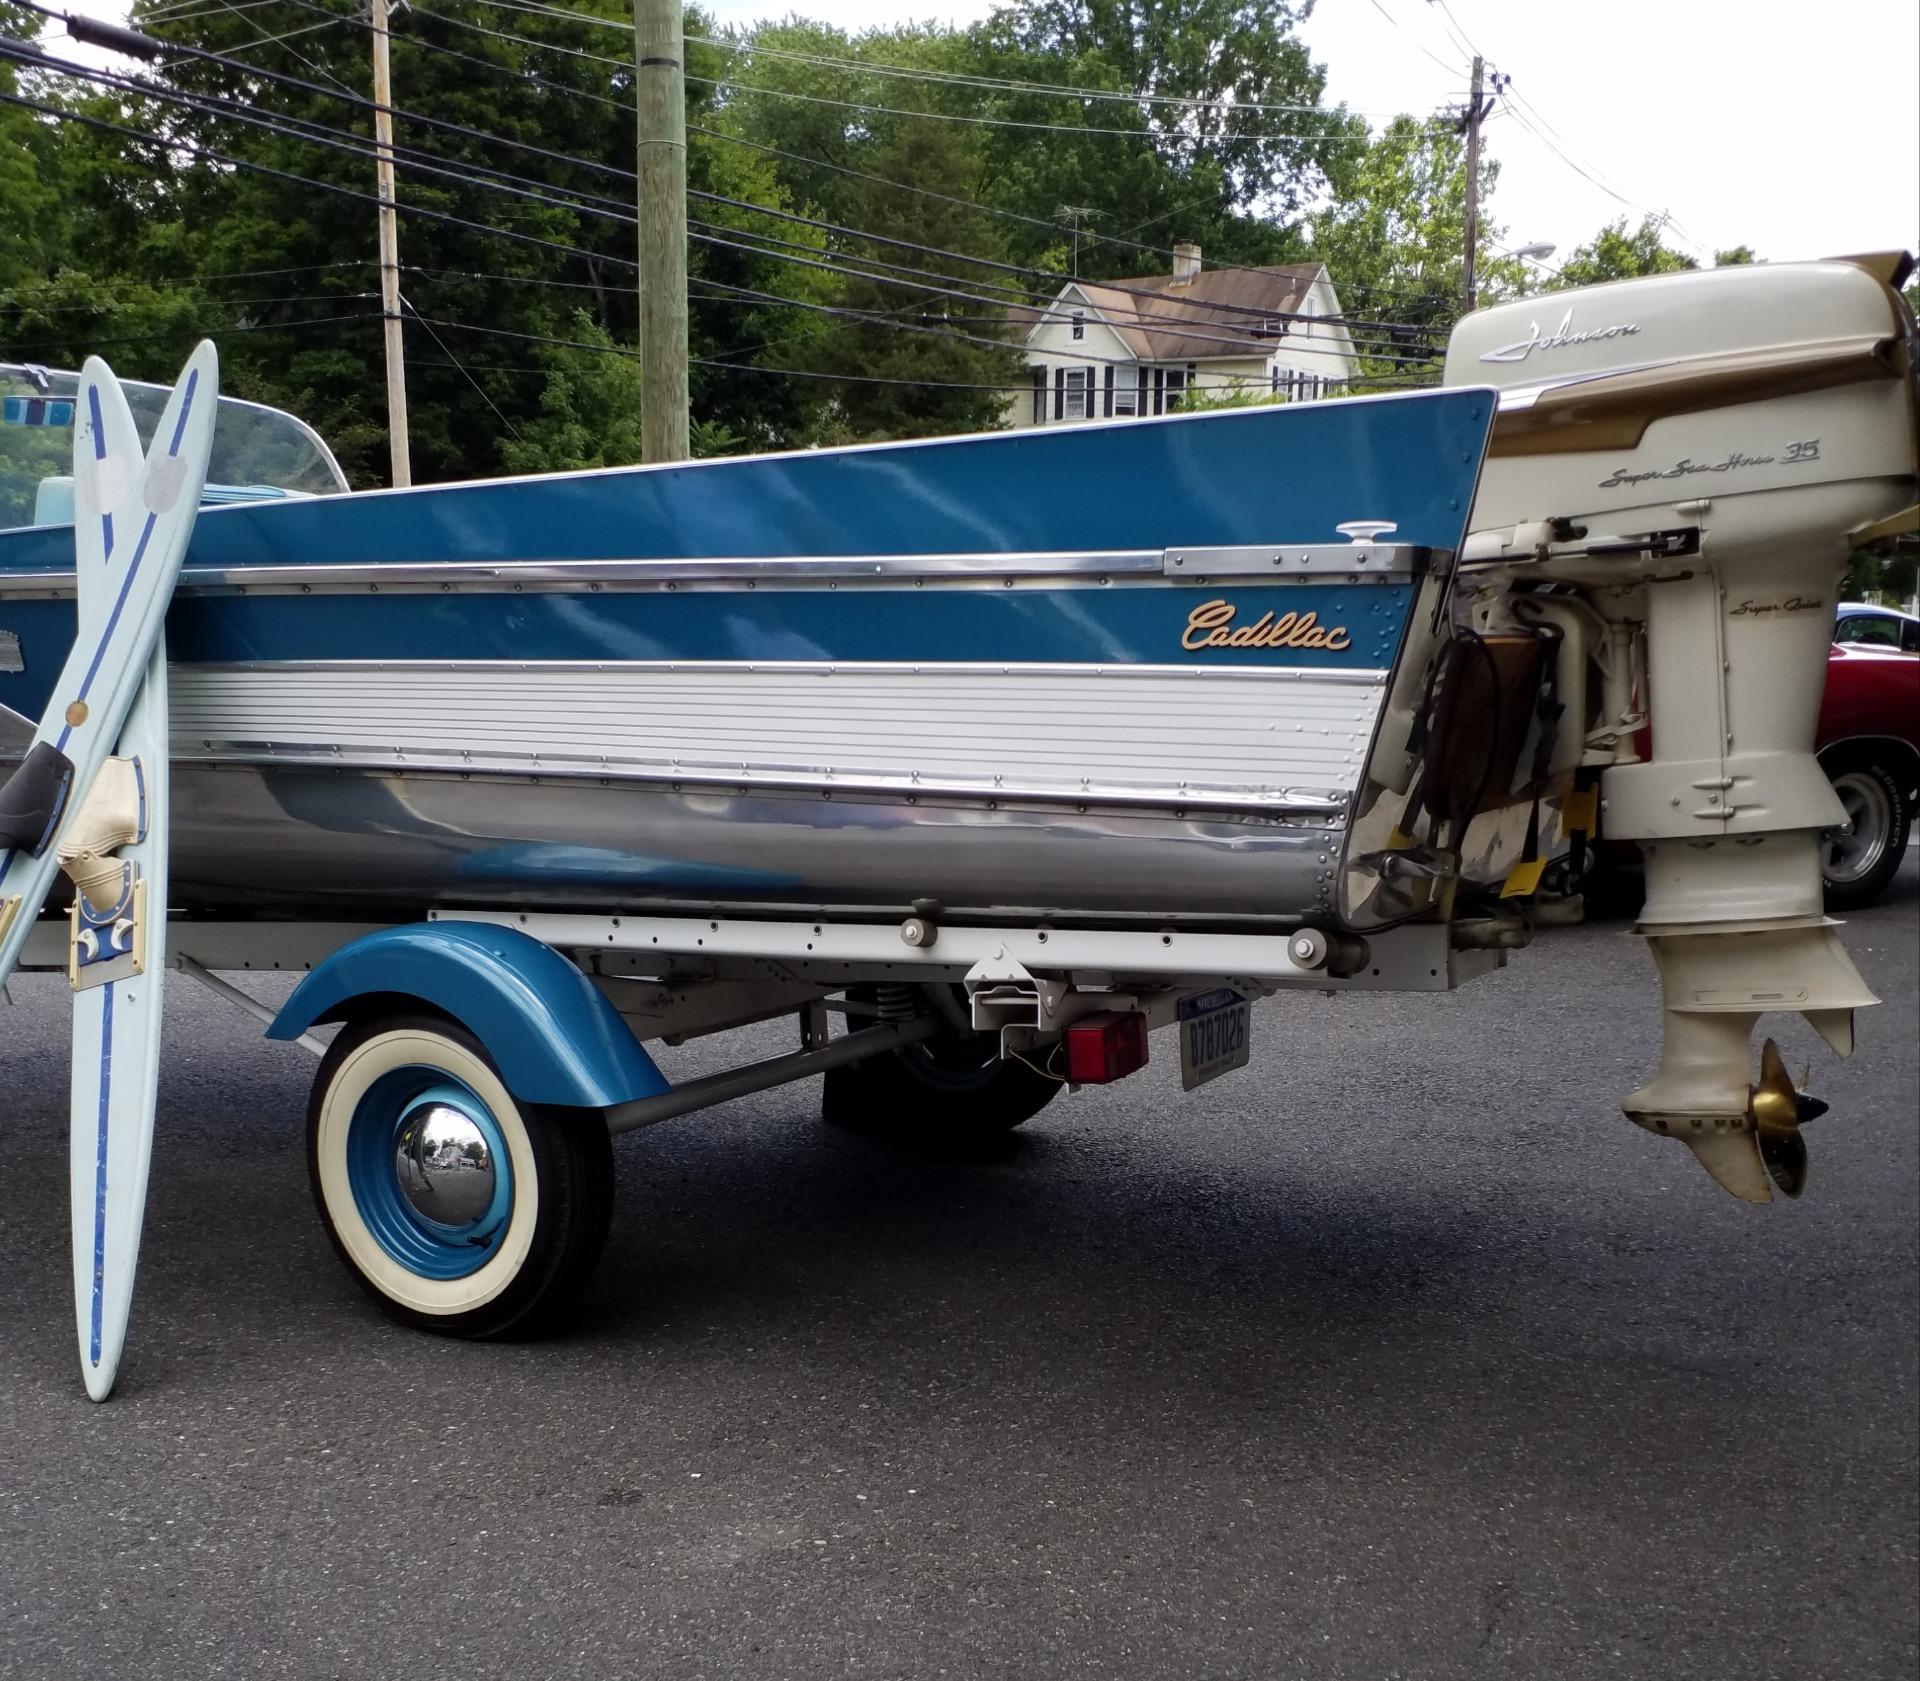 1957 Cadillac Lido Stock # 2567 For Sale Near Peapack, NJ